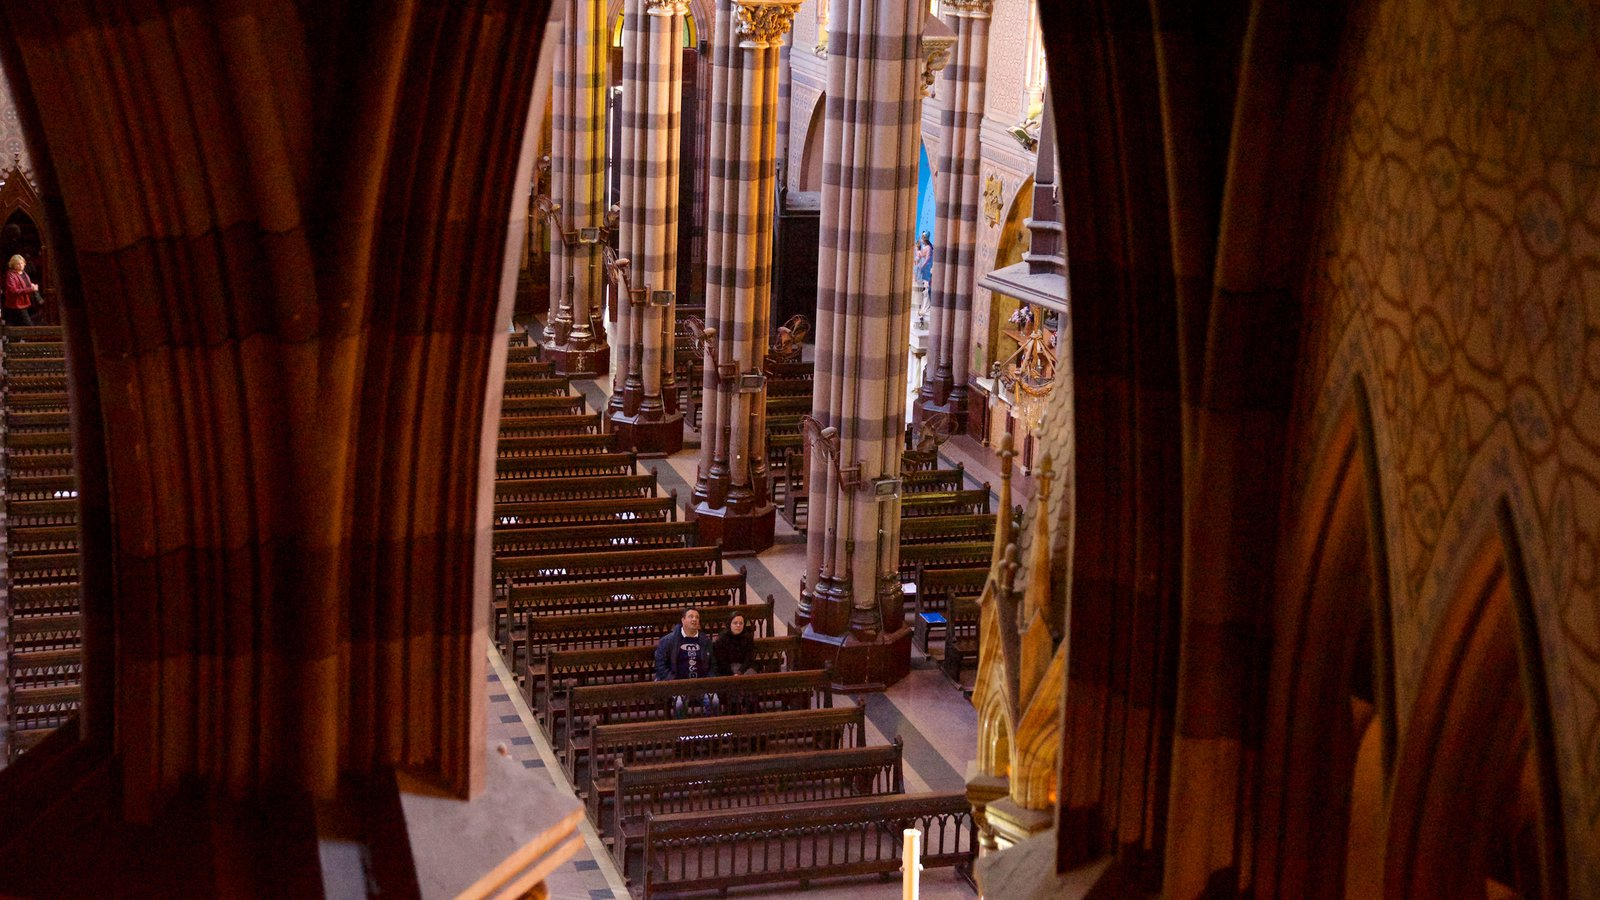 Iglesia del Sagrado Corazón mostrando vistas internas, uma igreja ou catedral e elementos religiosos